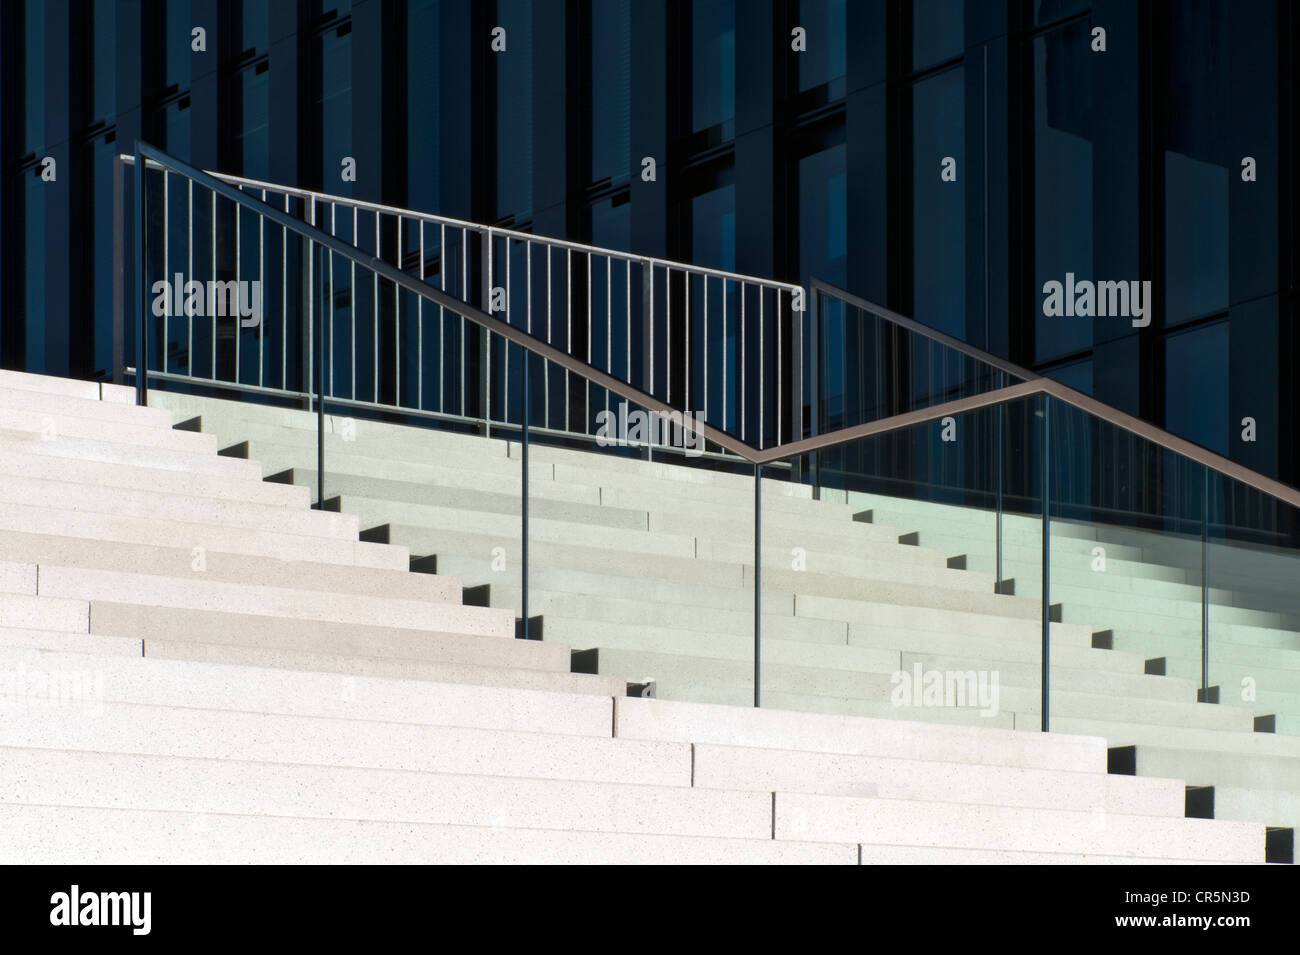 Stair Rail Stock Photos U0026 Stair Rail Stock Images   Alamy